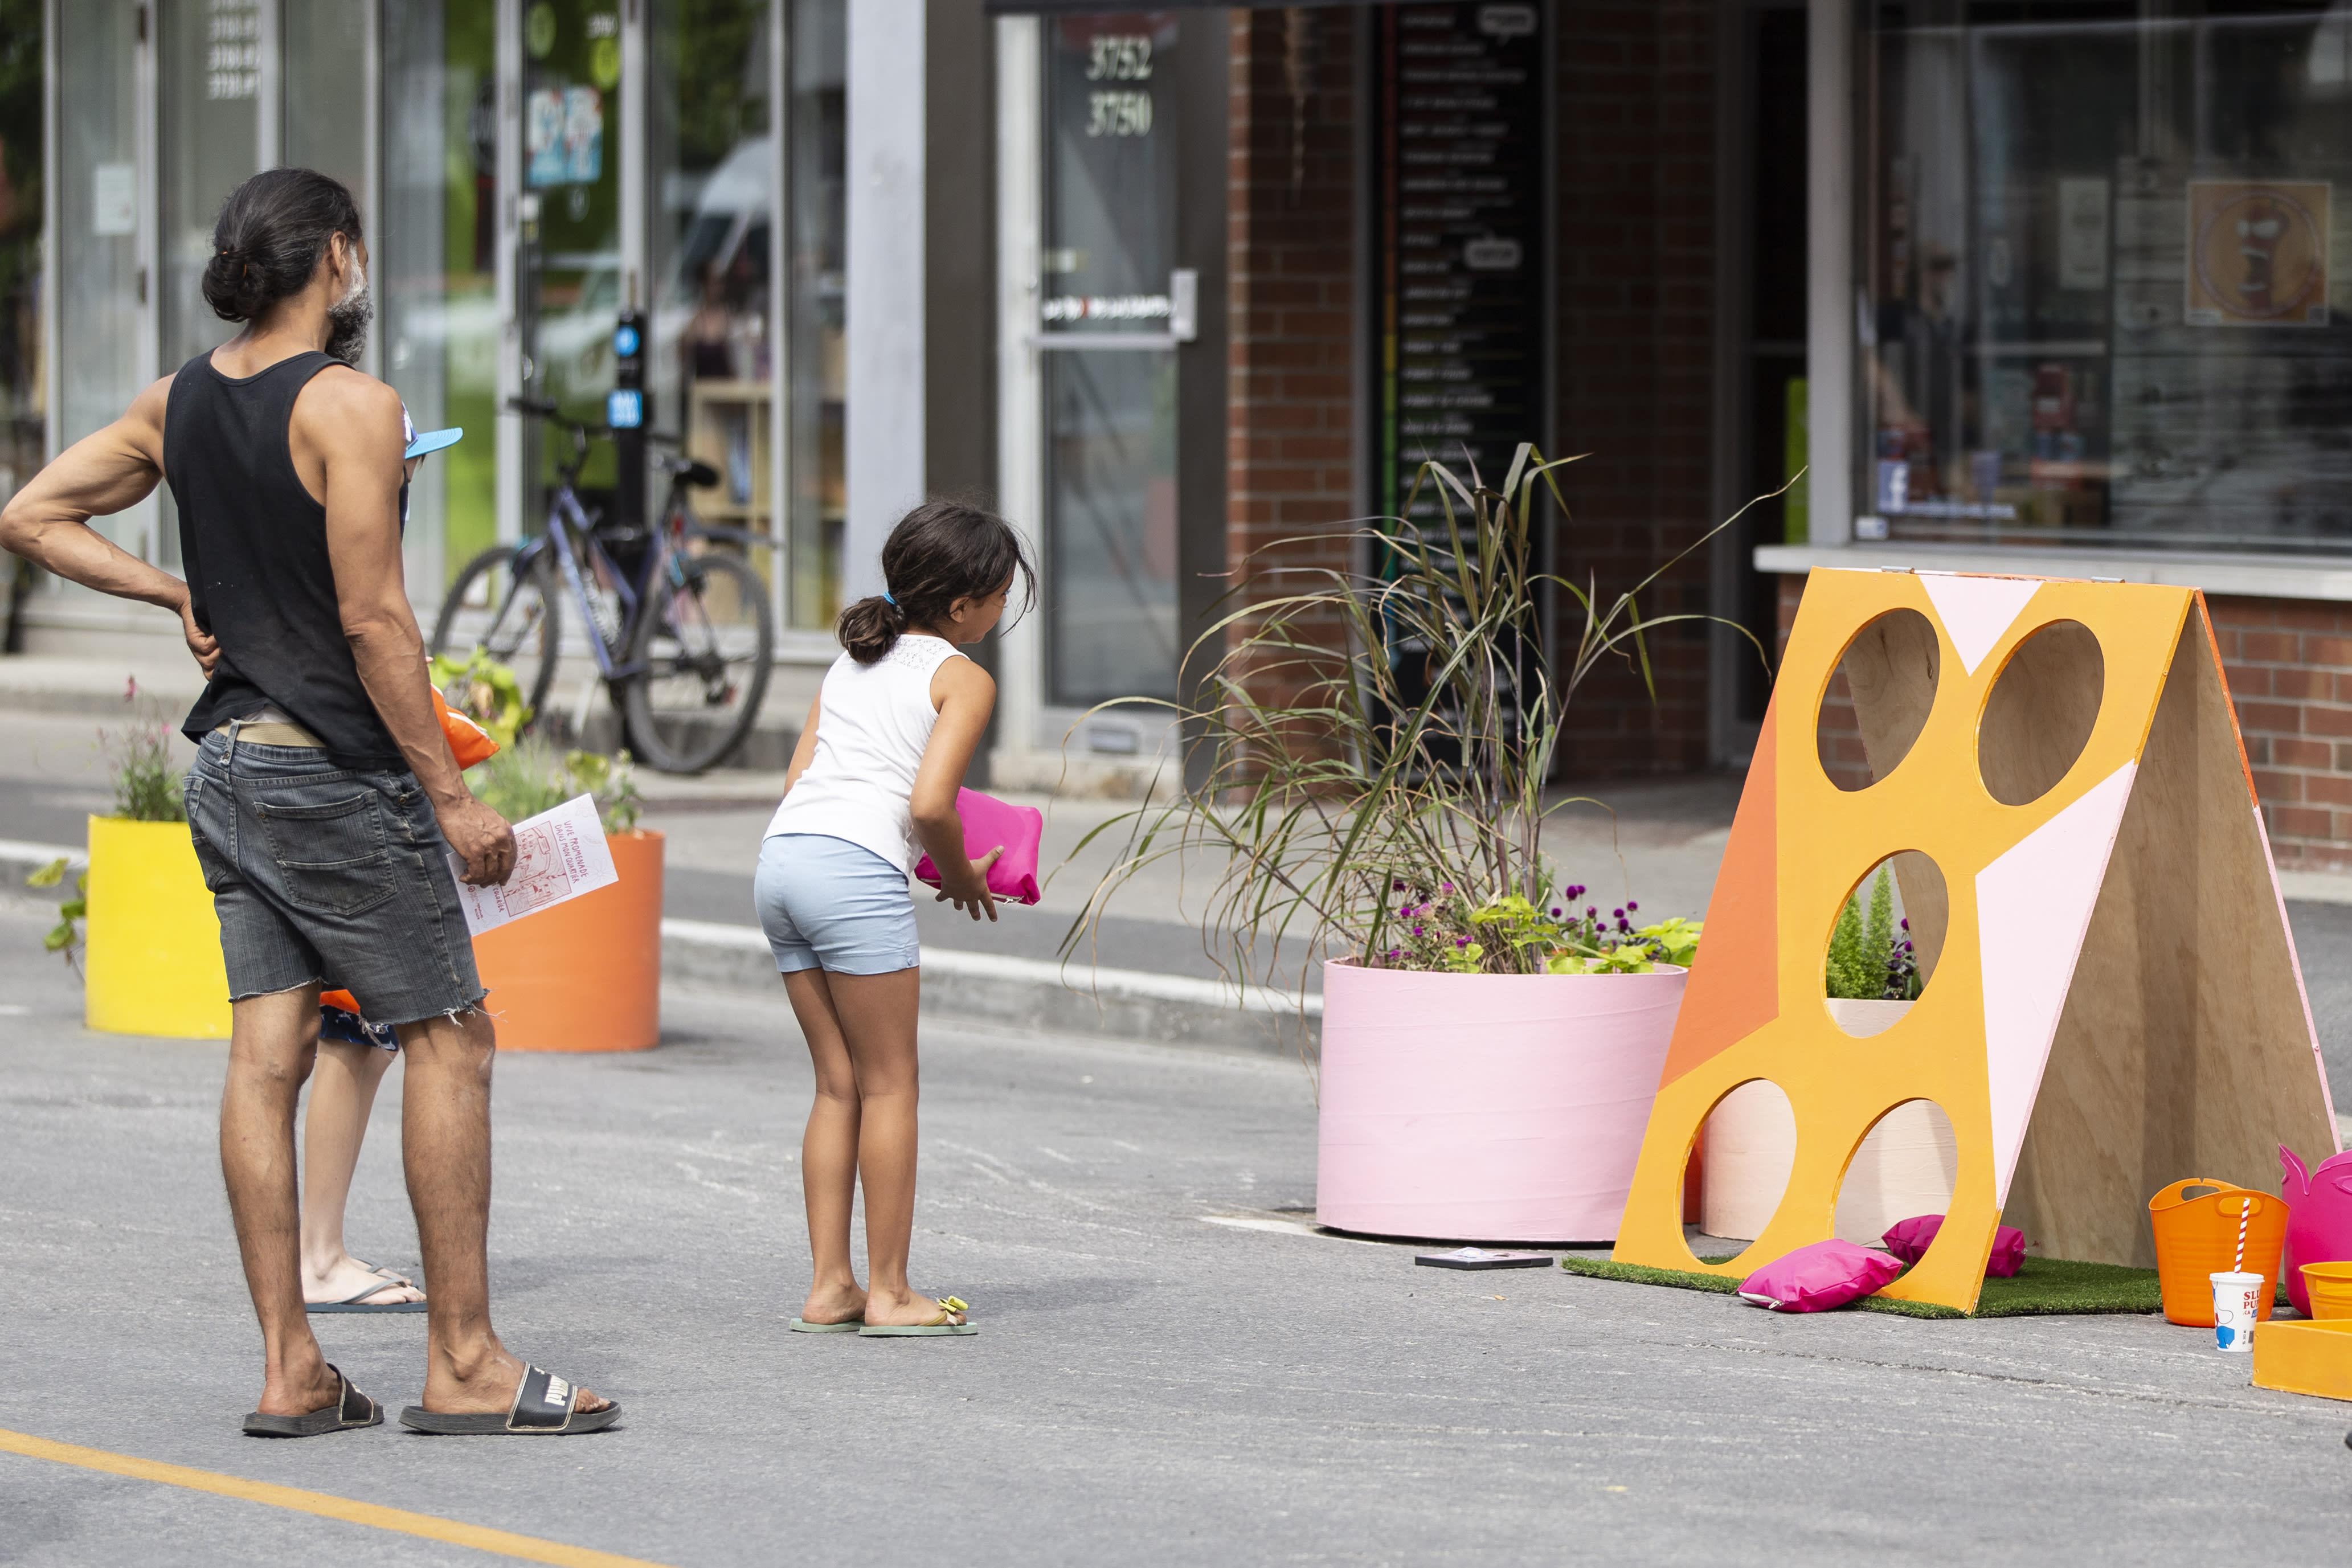 Promenade Ontario